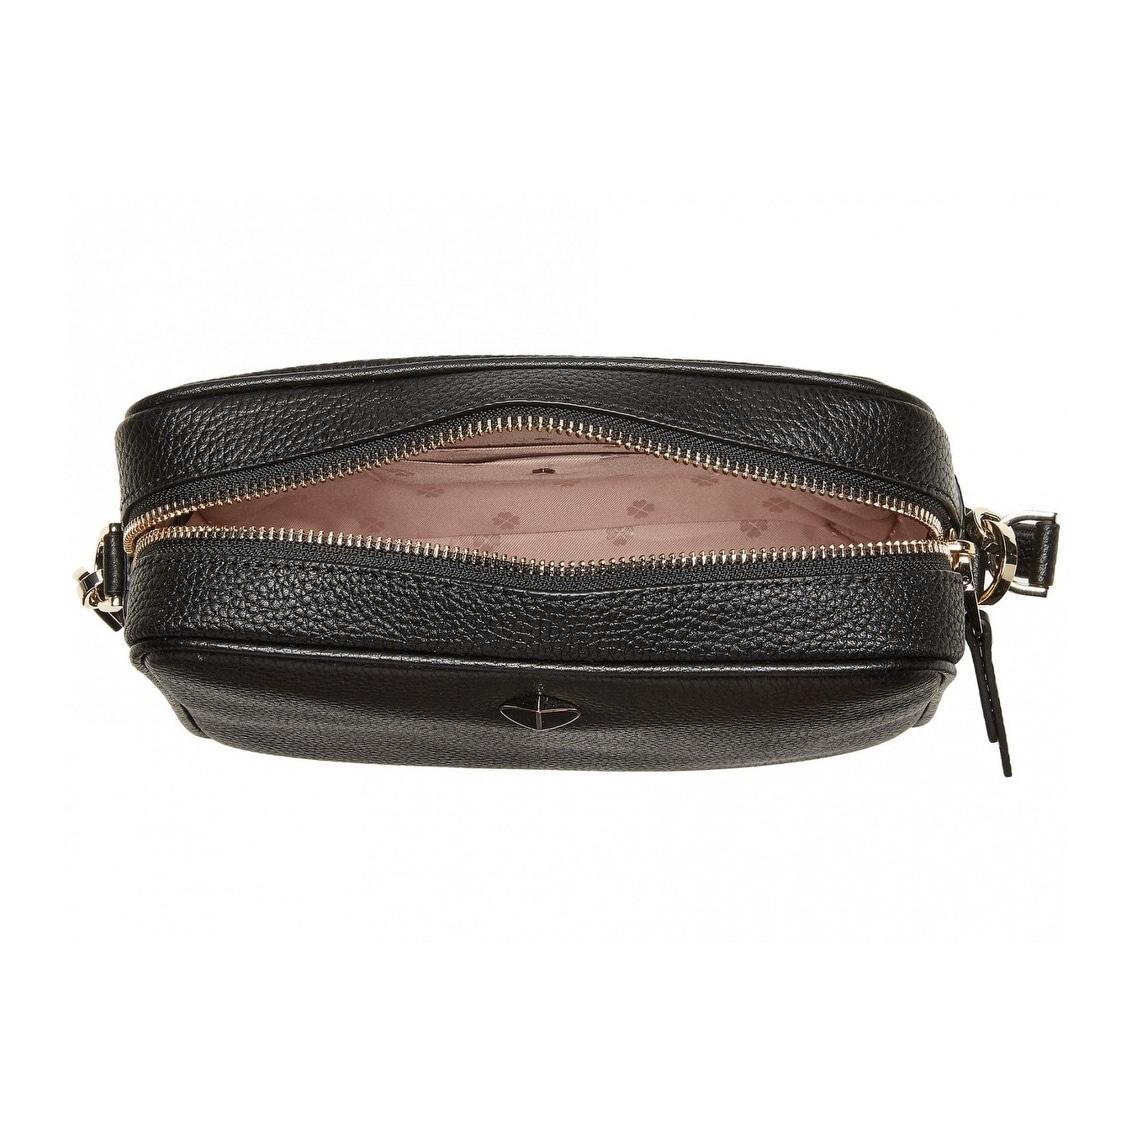 Shop Kate Spade Polly Medium Camera Bag Black Overstock 30118166